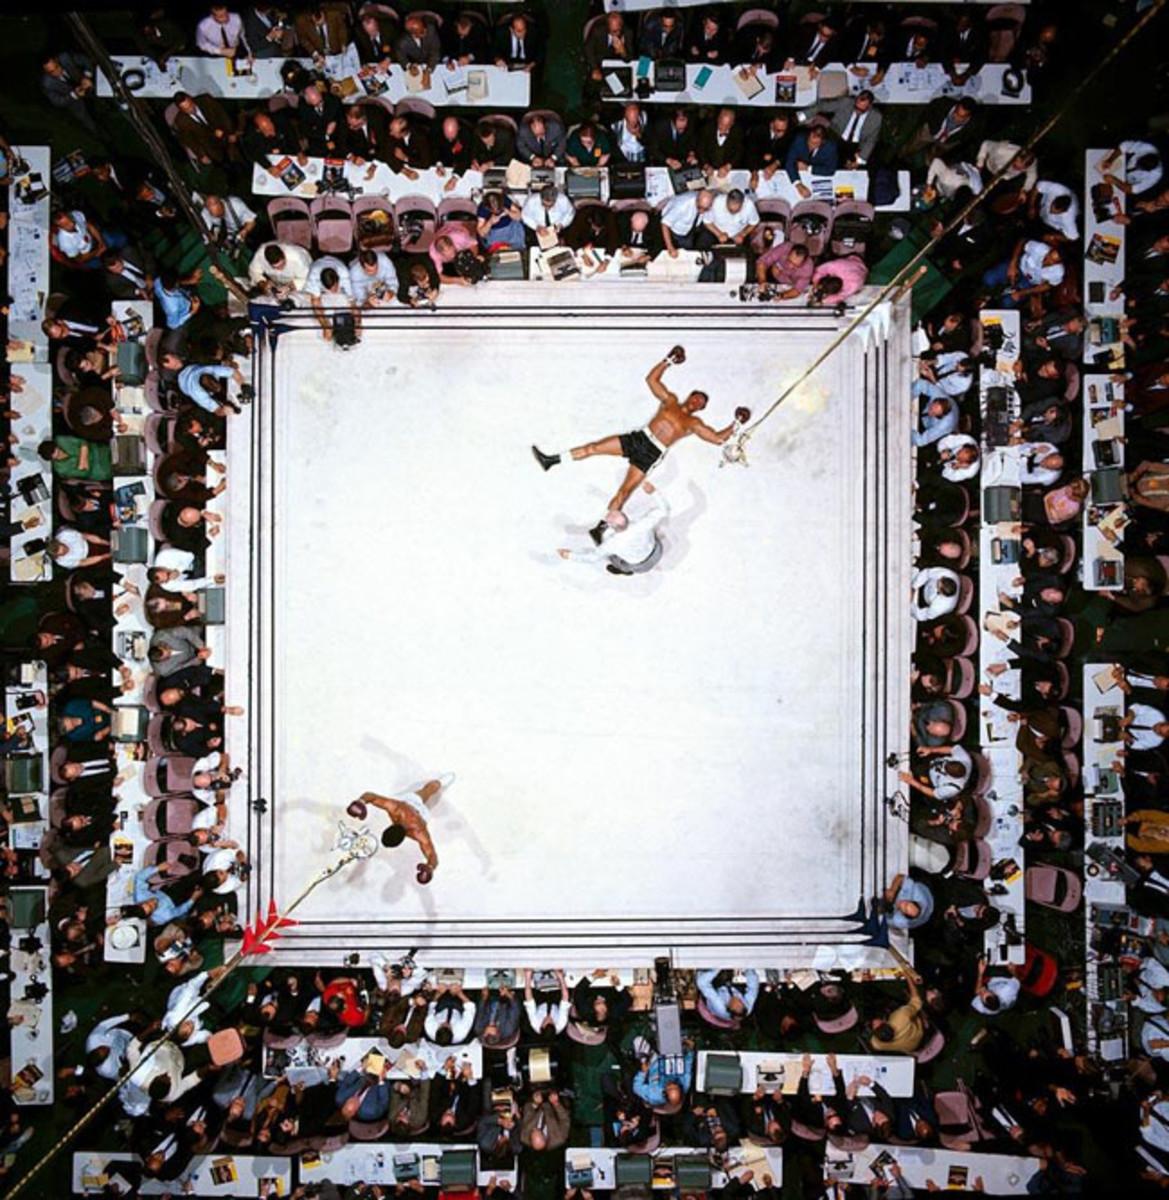 06-1966-1114-Muhammad-Ali-Cleveland-Williams-001339166.jpg